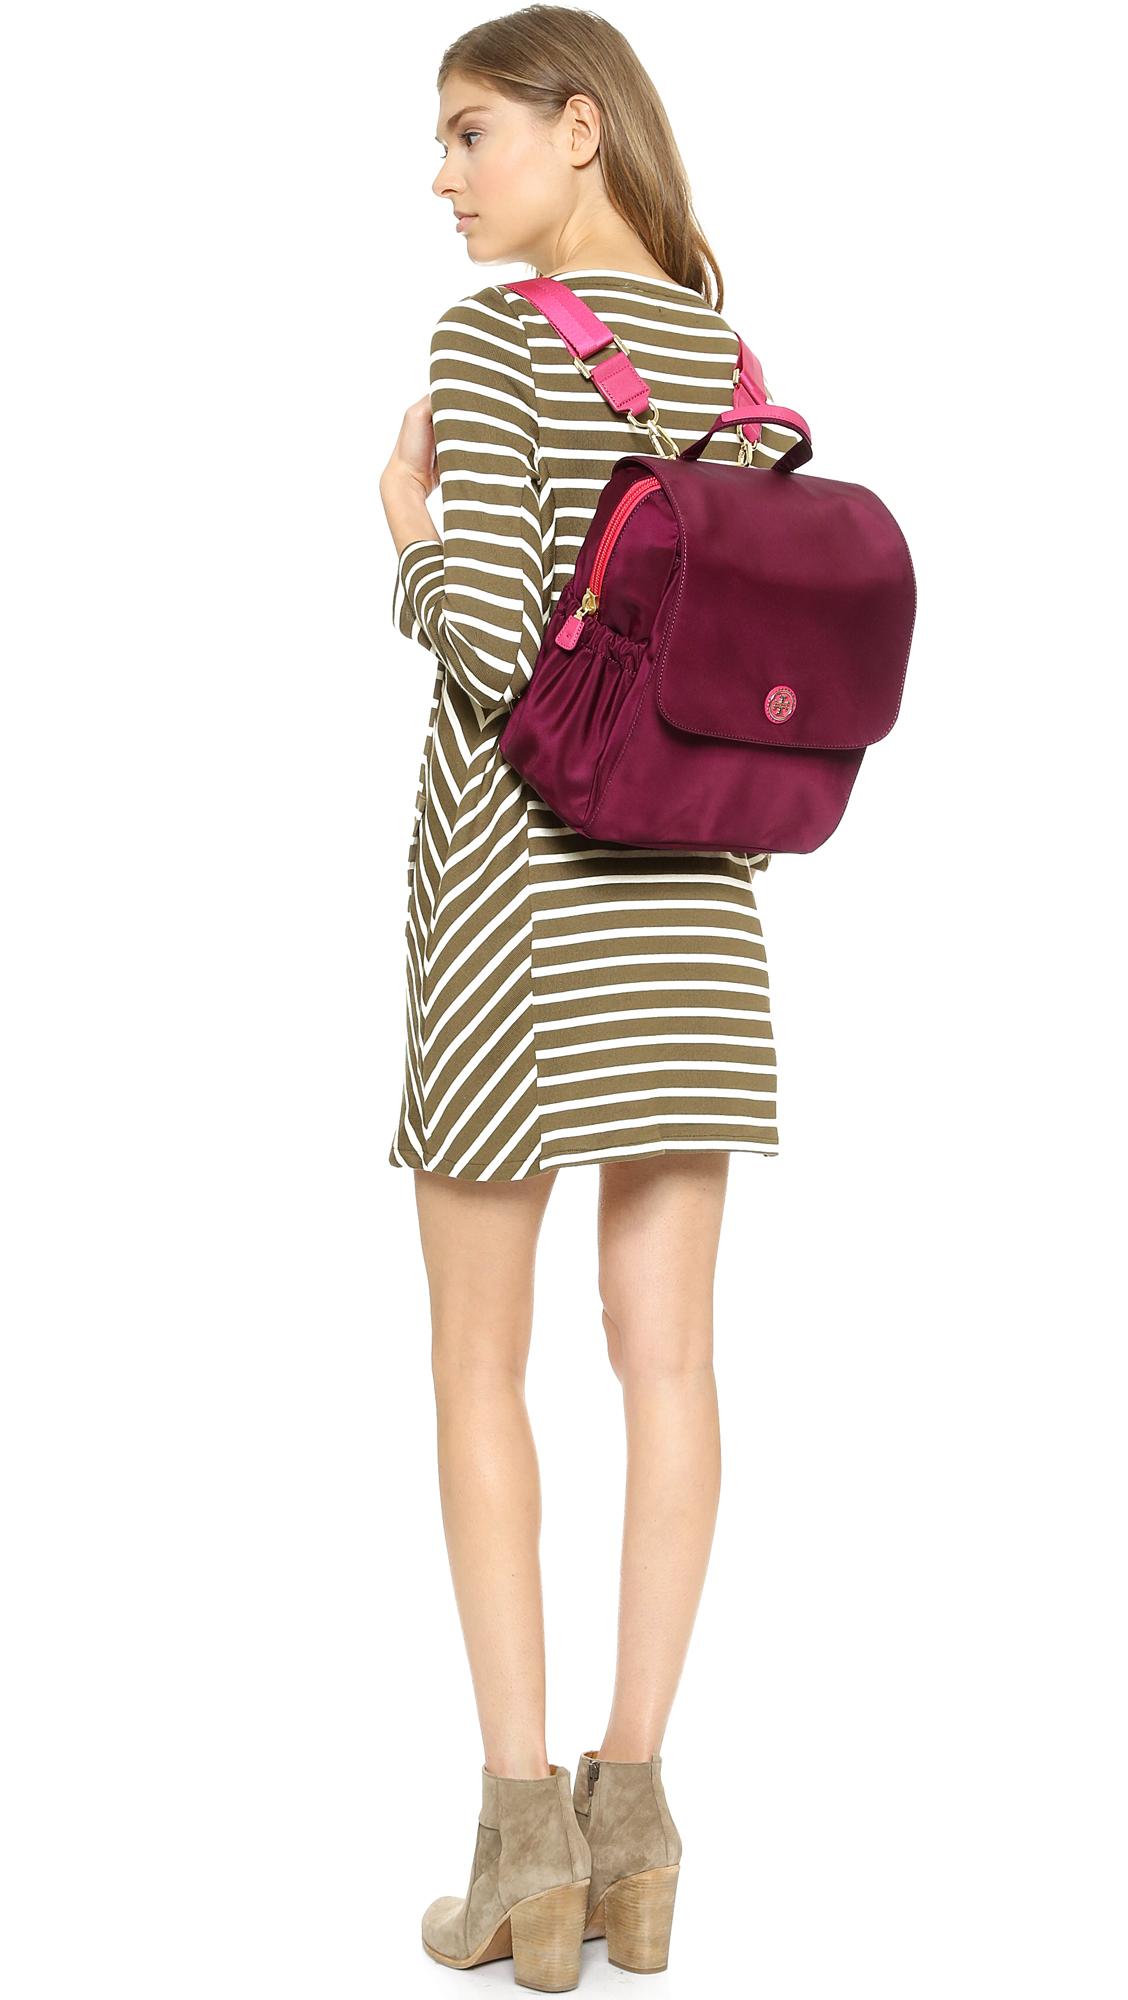 Tory Burch Travel Nylon Baby Backpack Shopbop